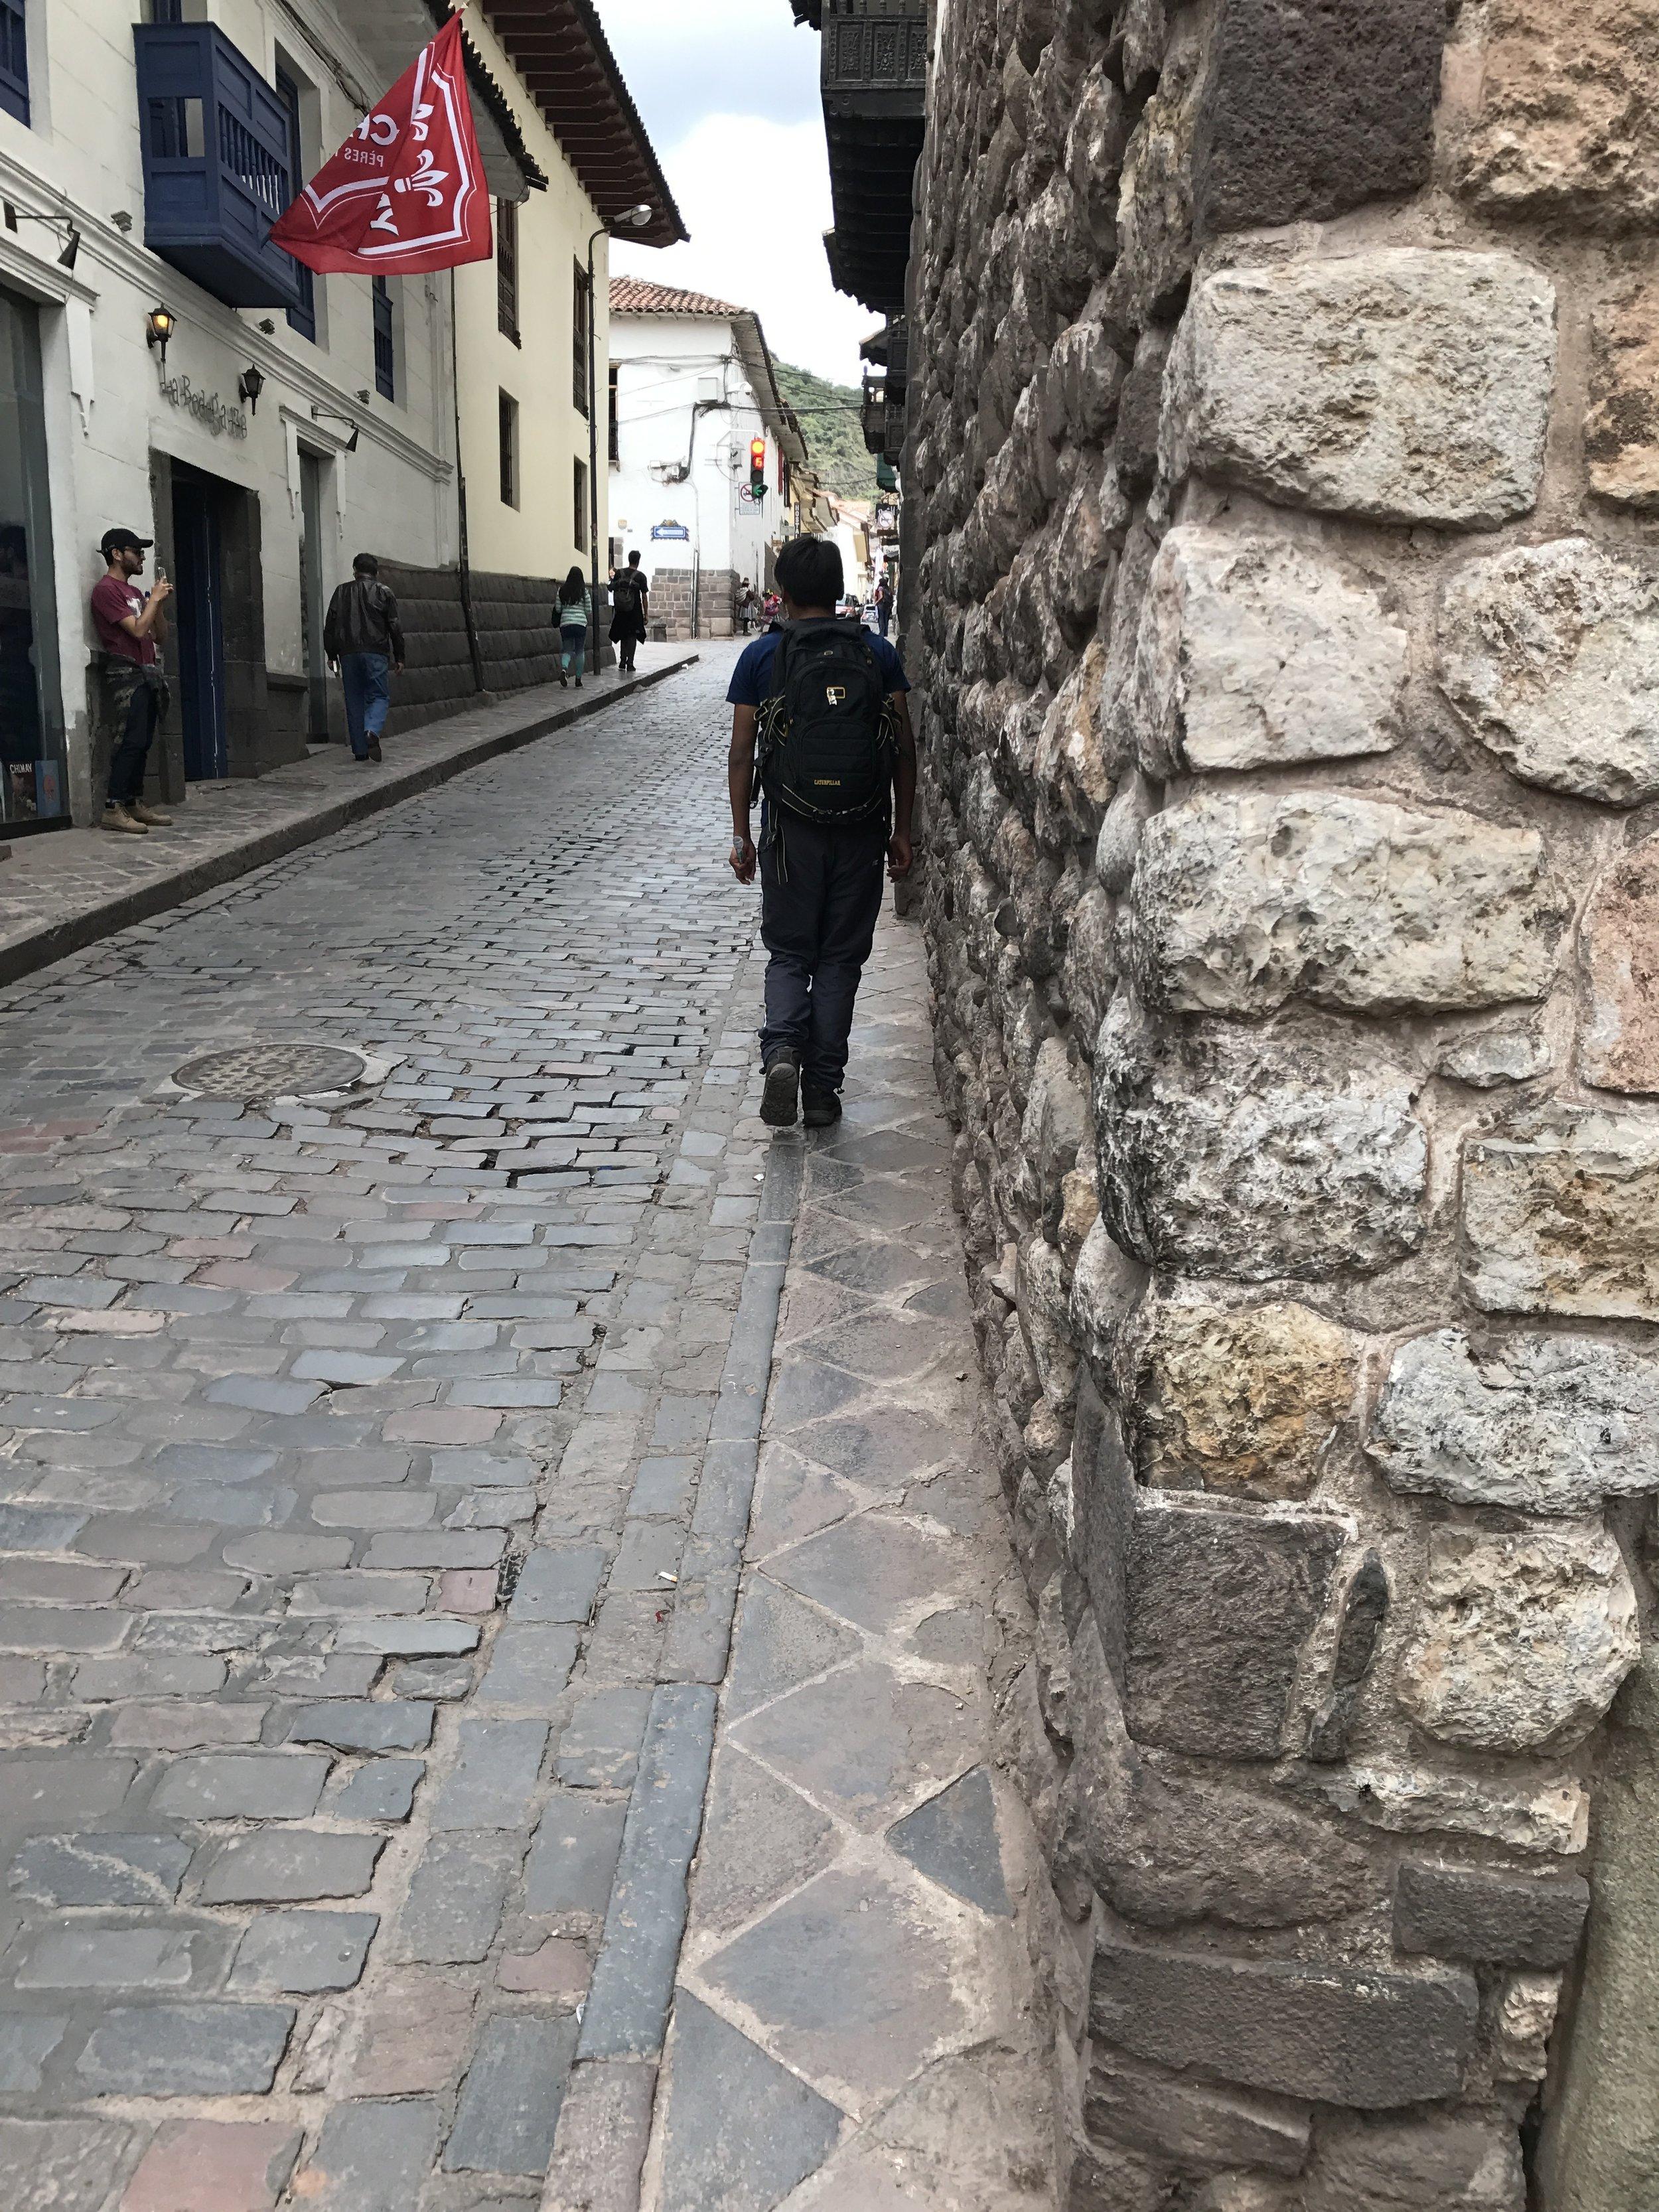 Narrow streets and sidewalks in Cusco.